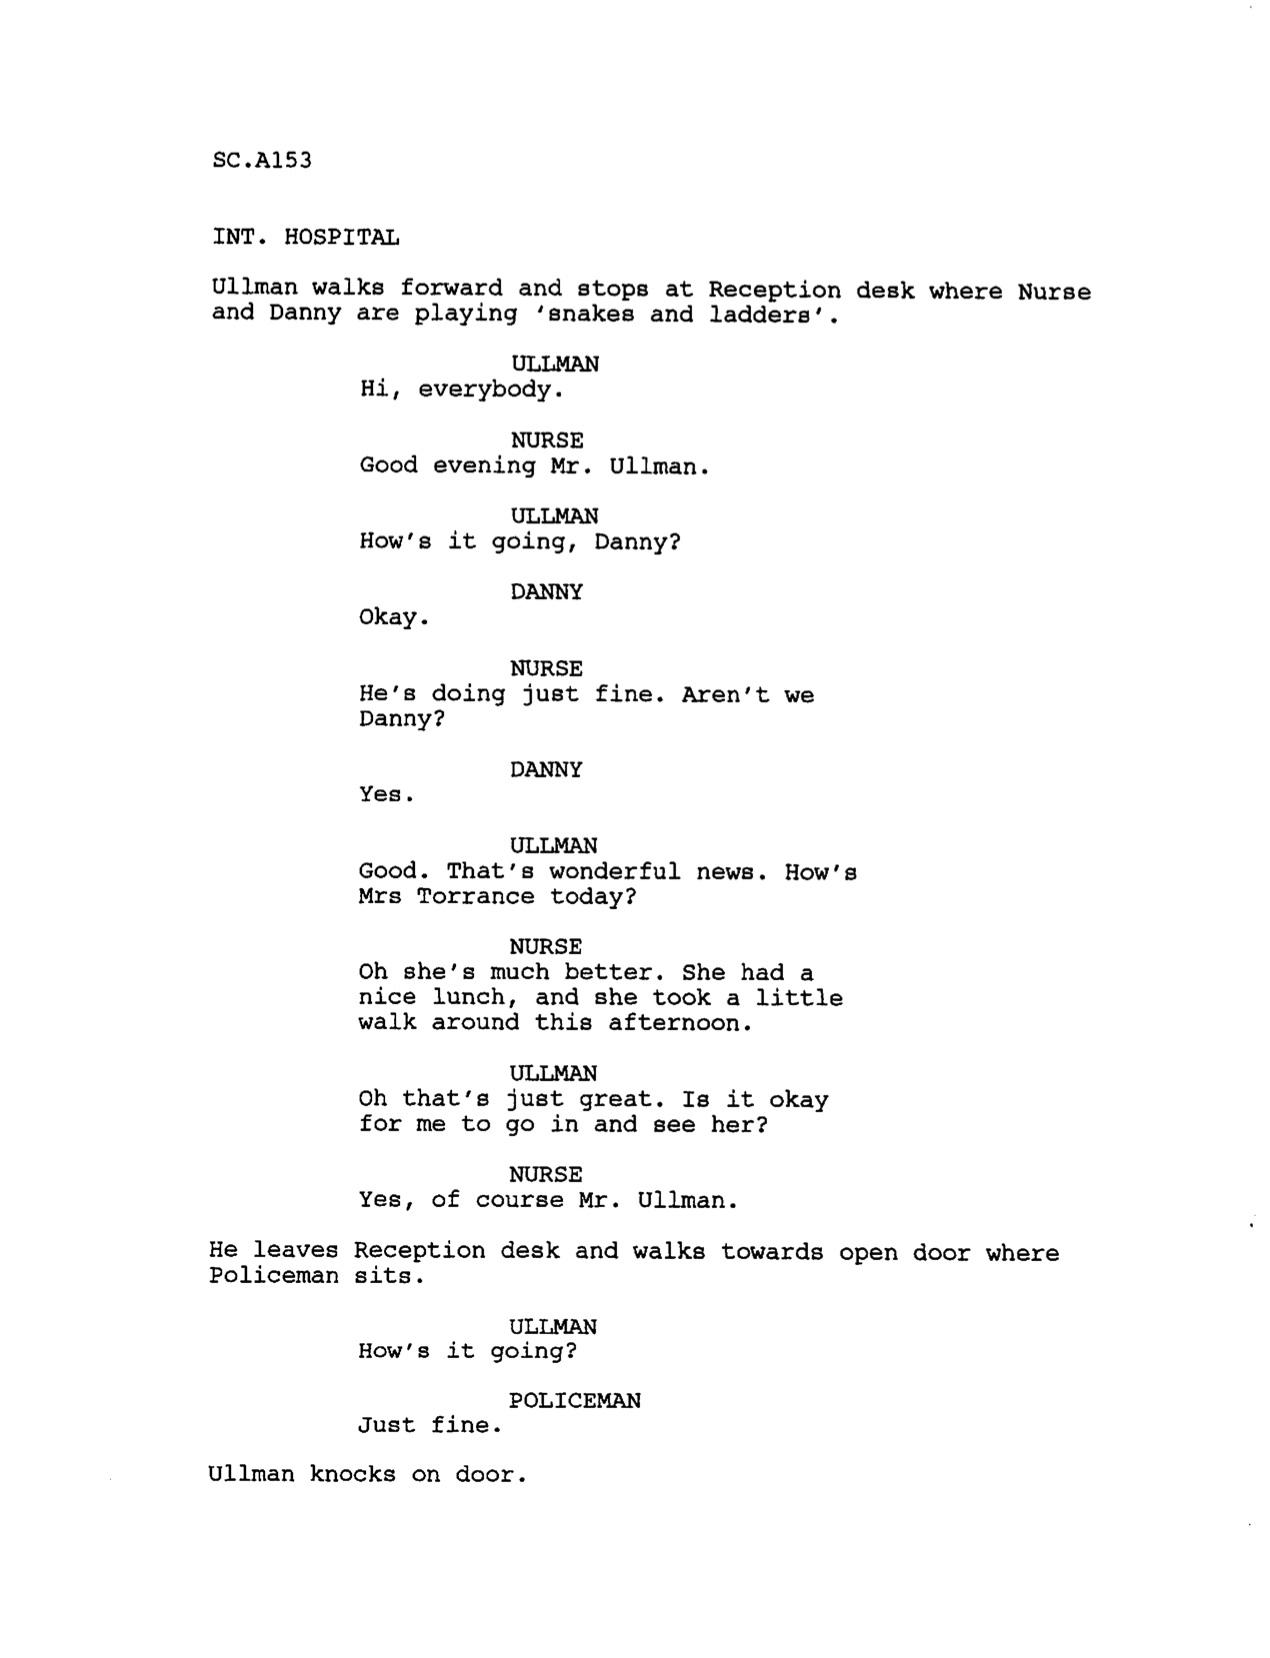 Stanley Kubrick's Original Hopeful Ending To THE SHINING